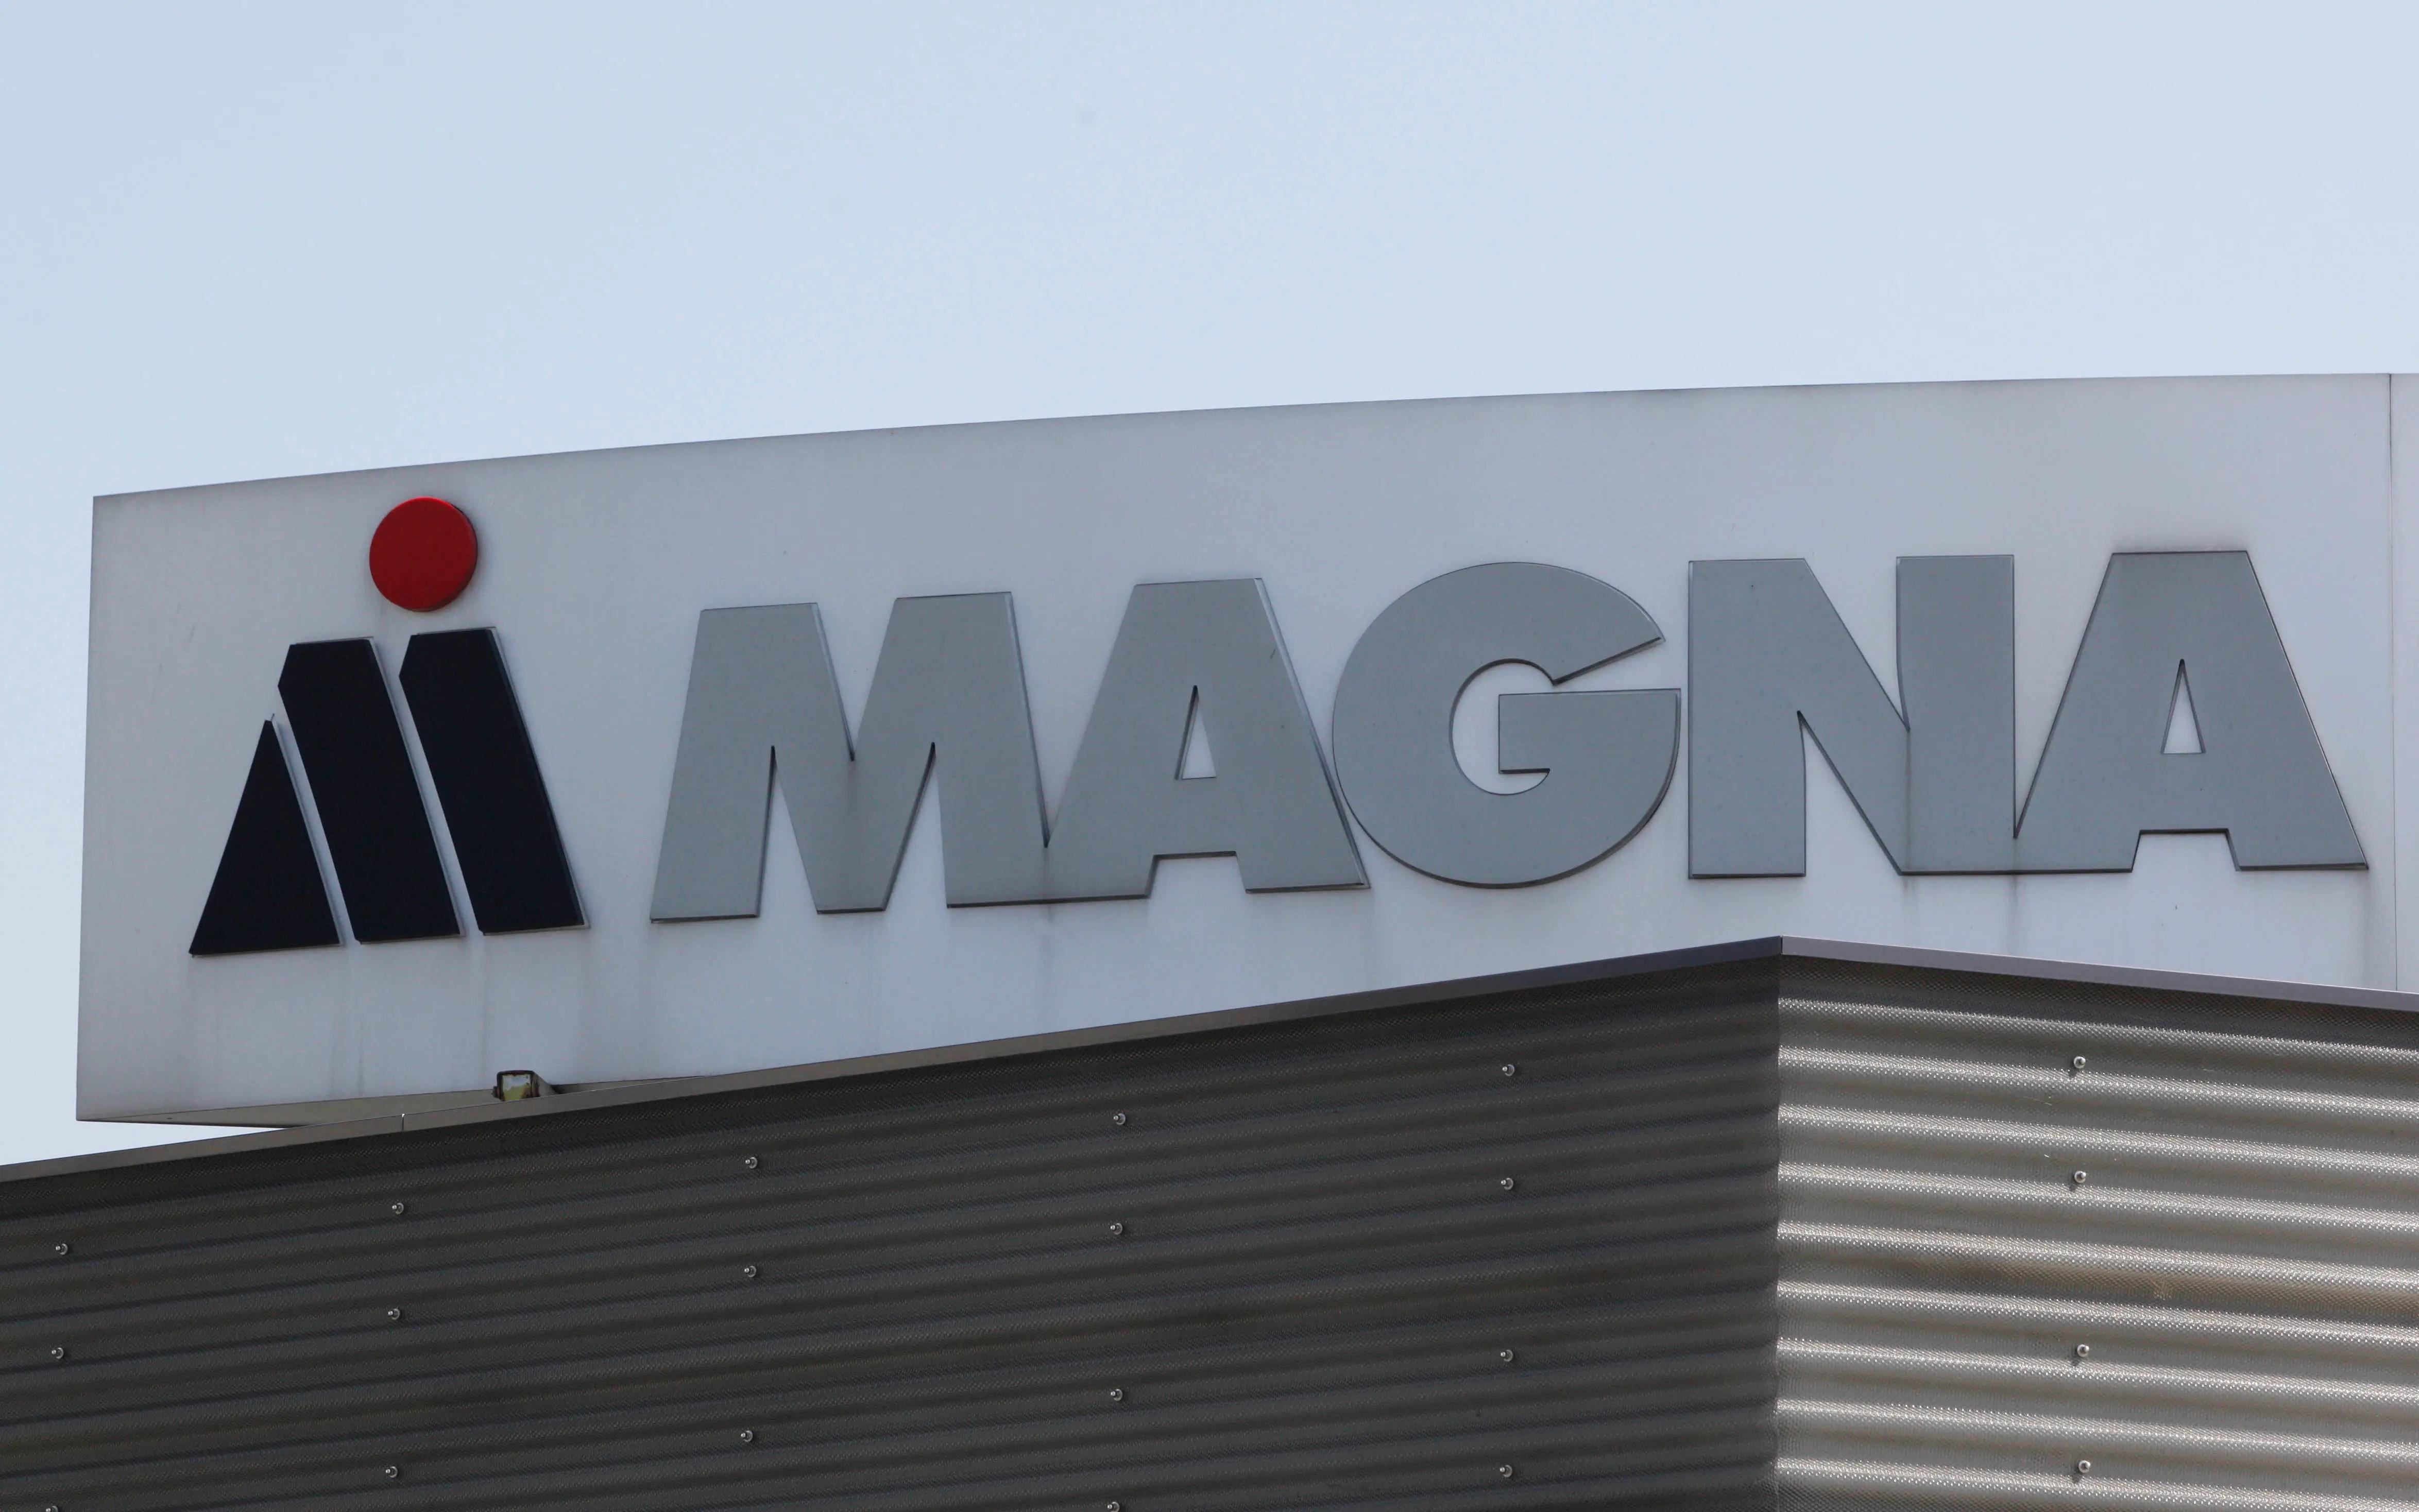 Magna is a massive company.